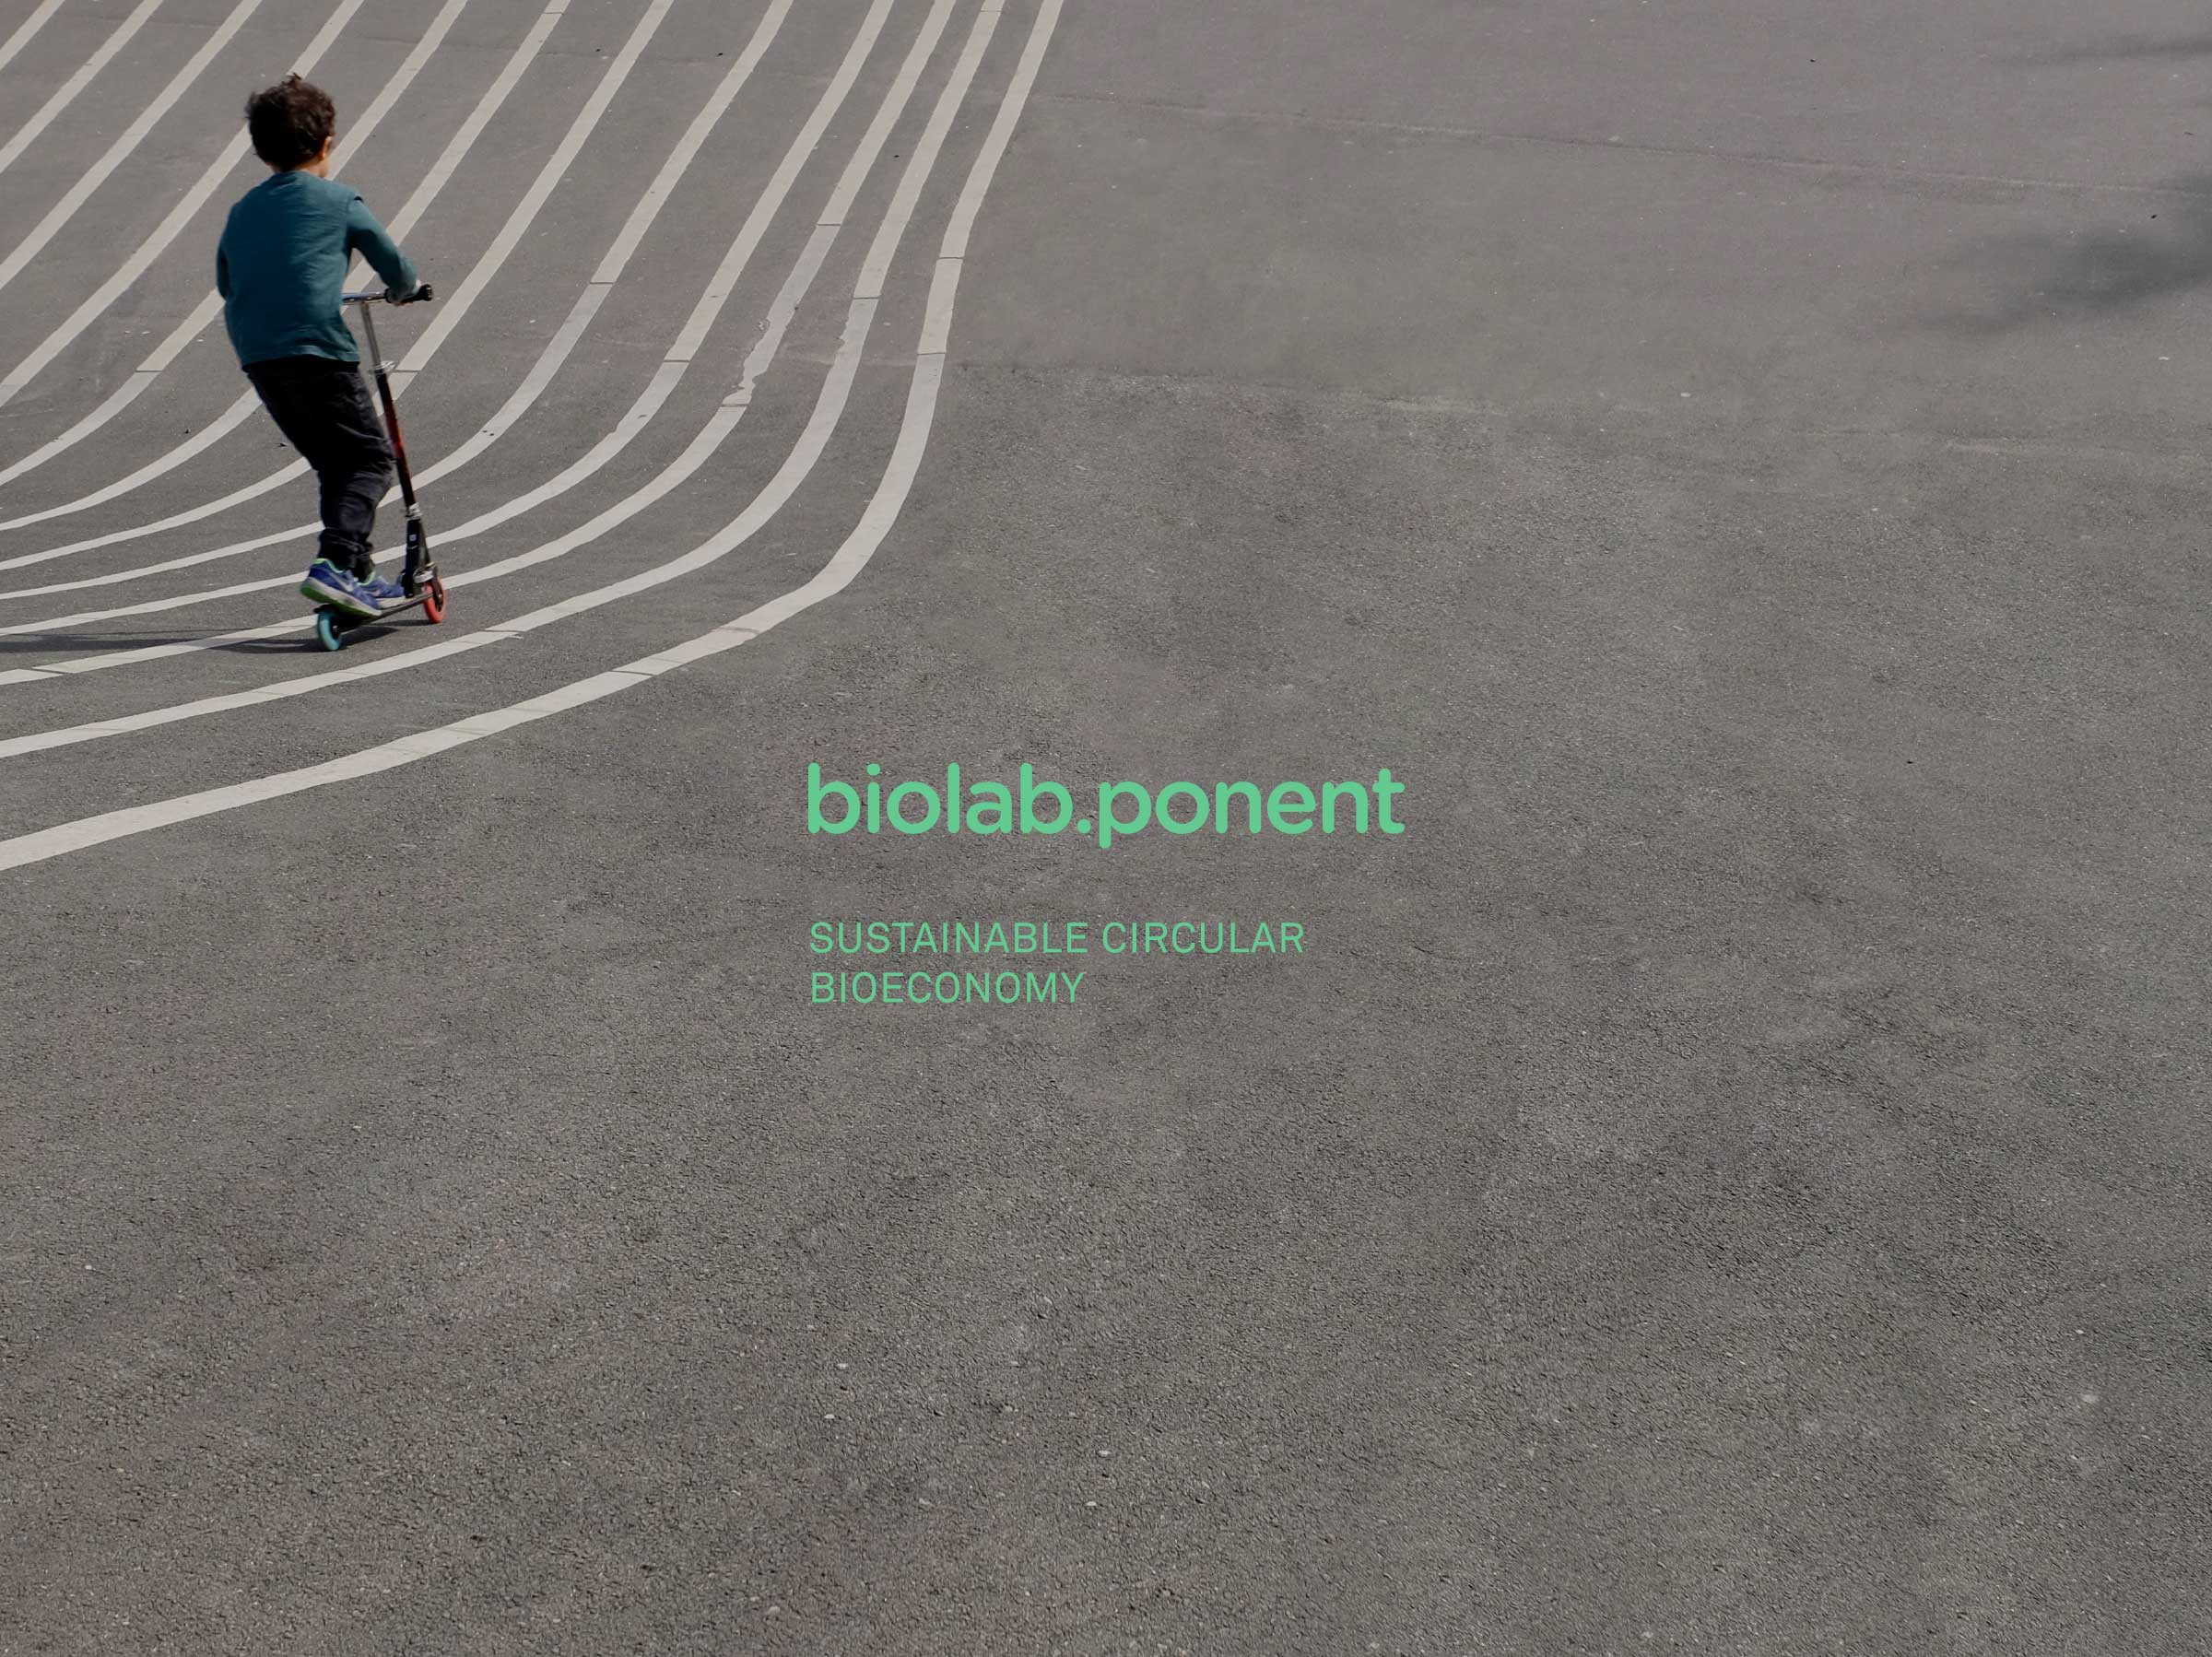 Biolab_Ponent-2019-branding-Latipo-4